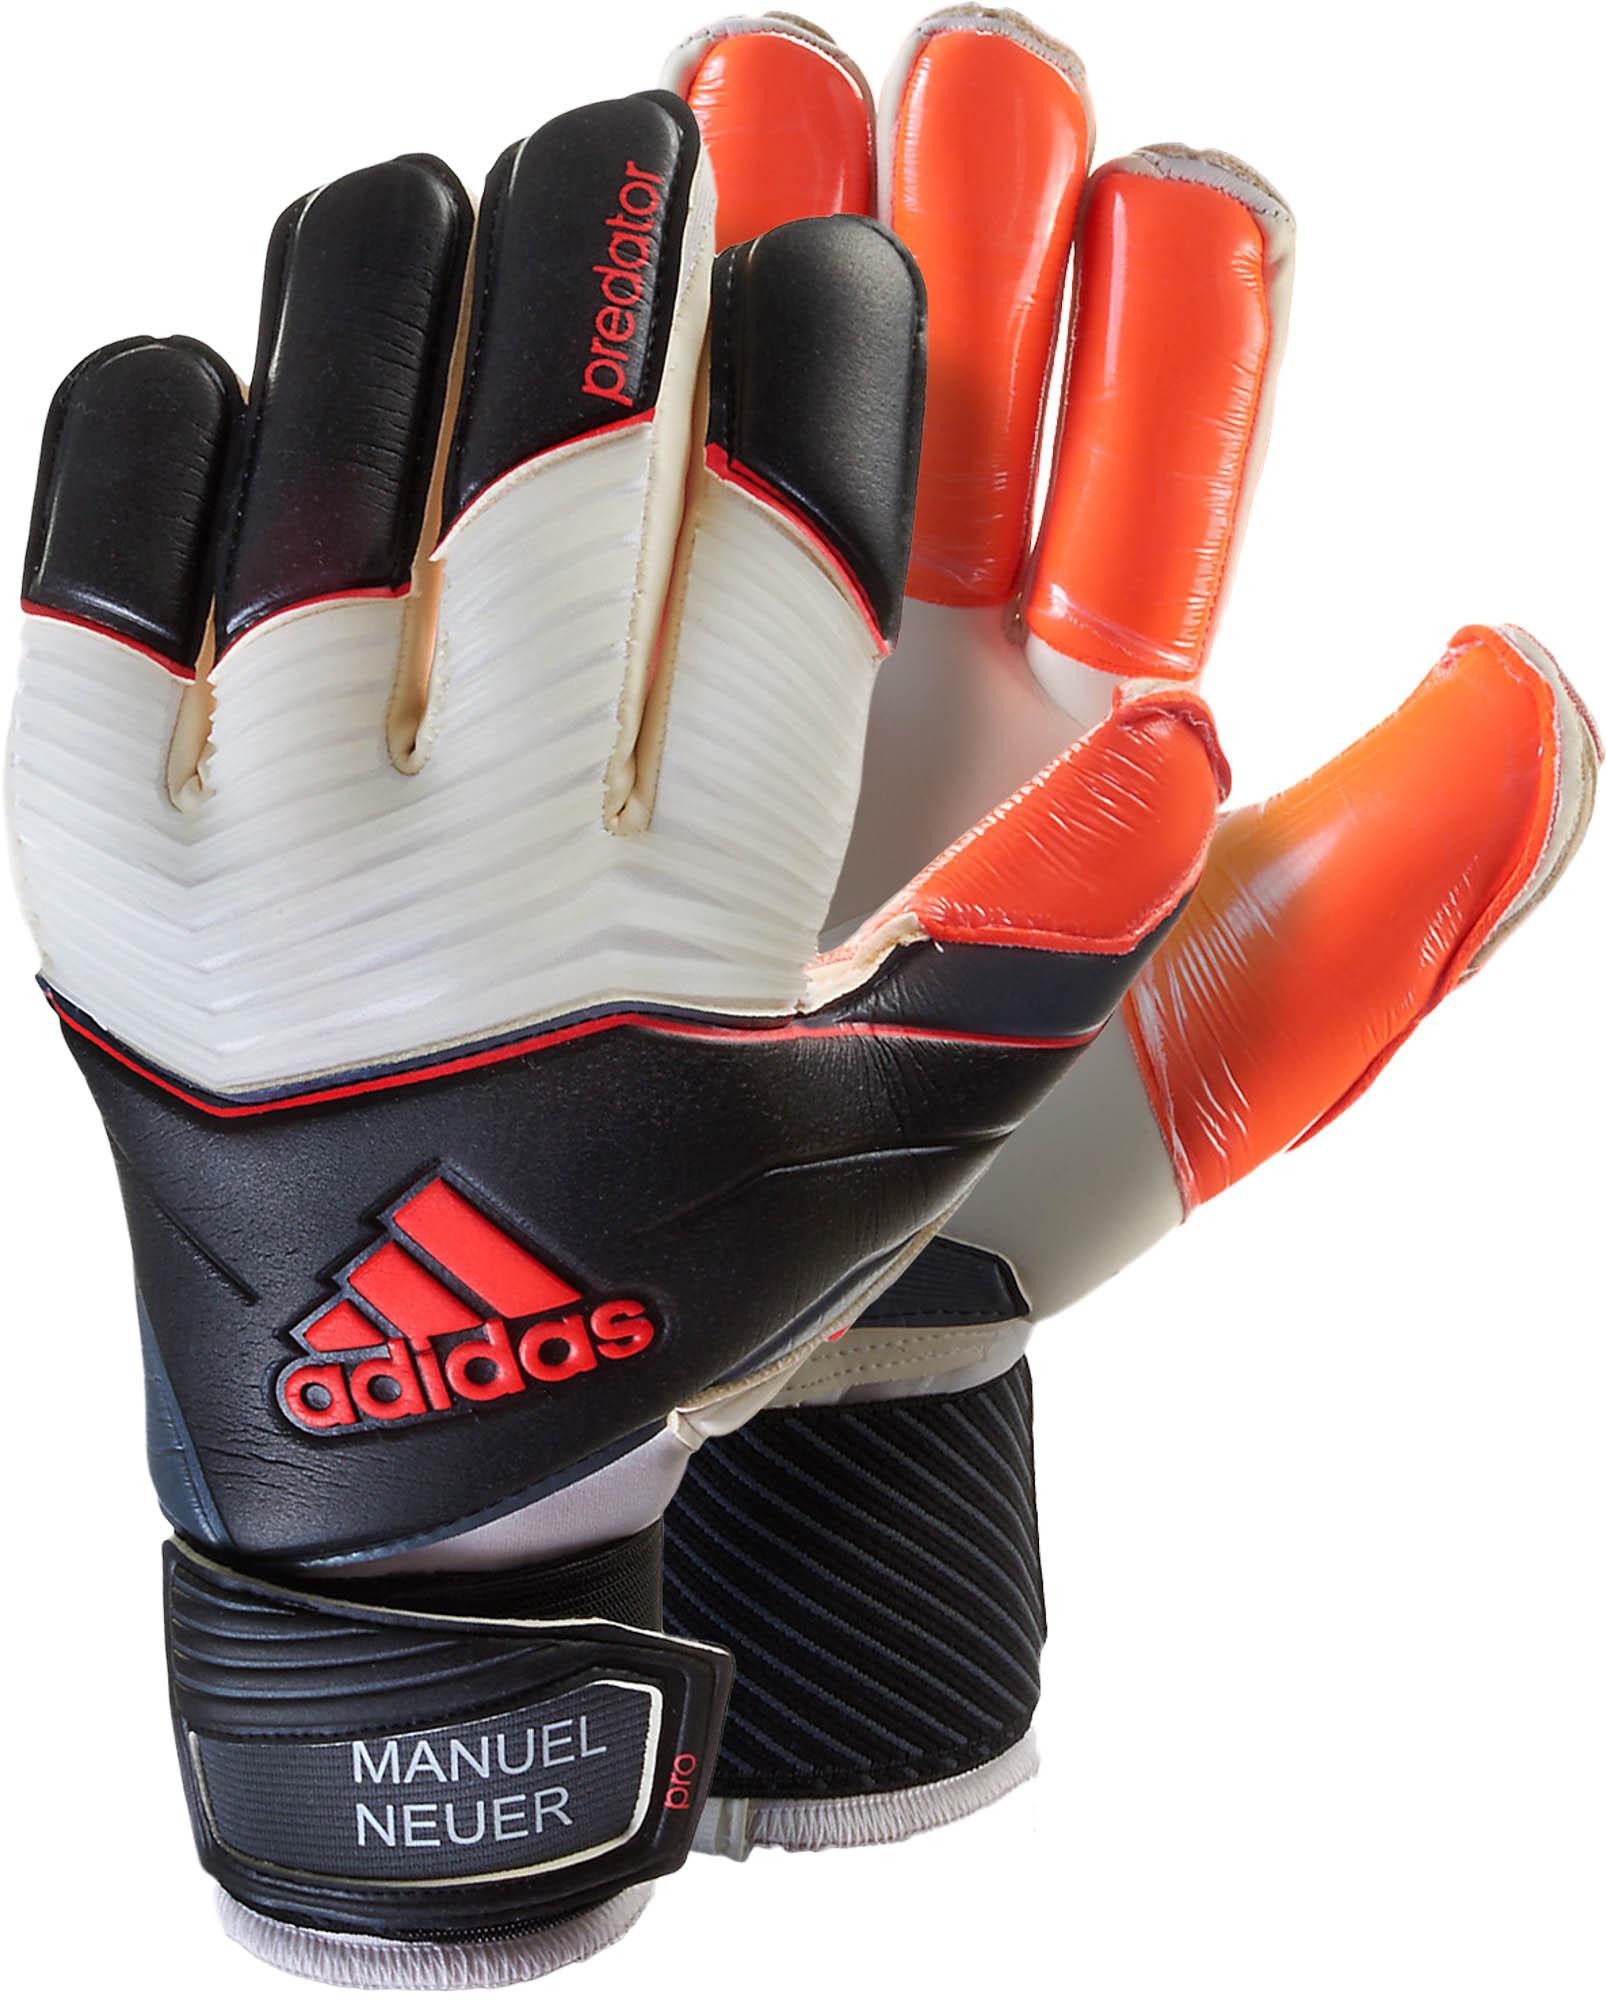 adidas ace zones pro goalkeeper gloves